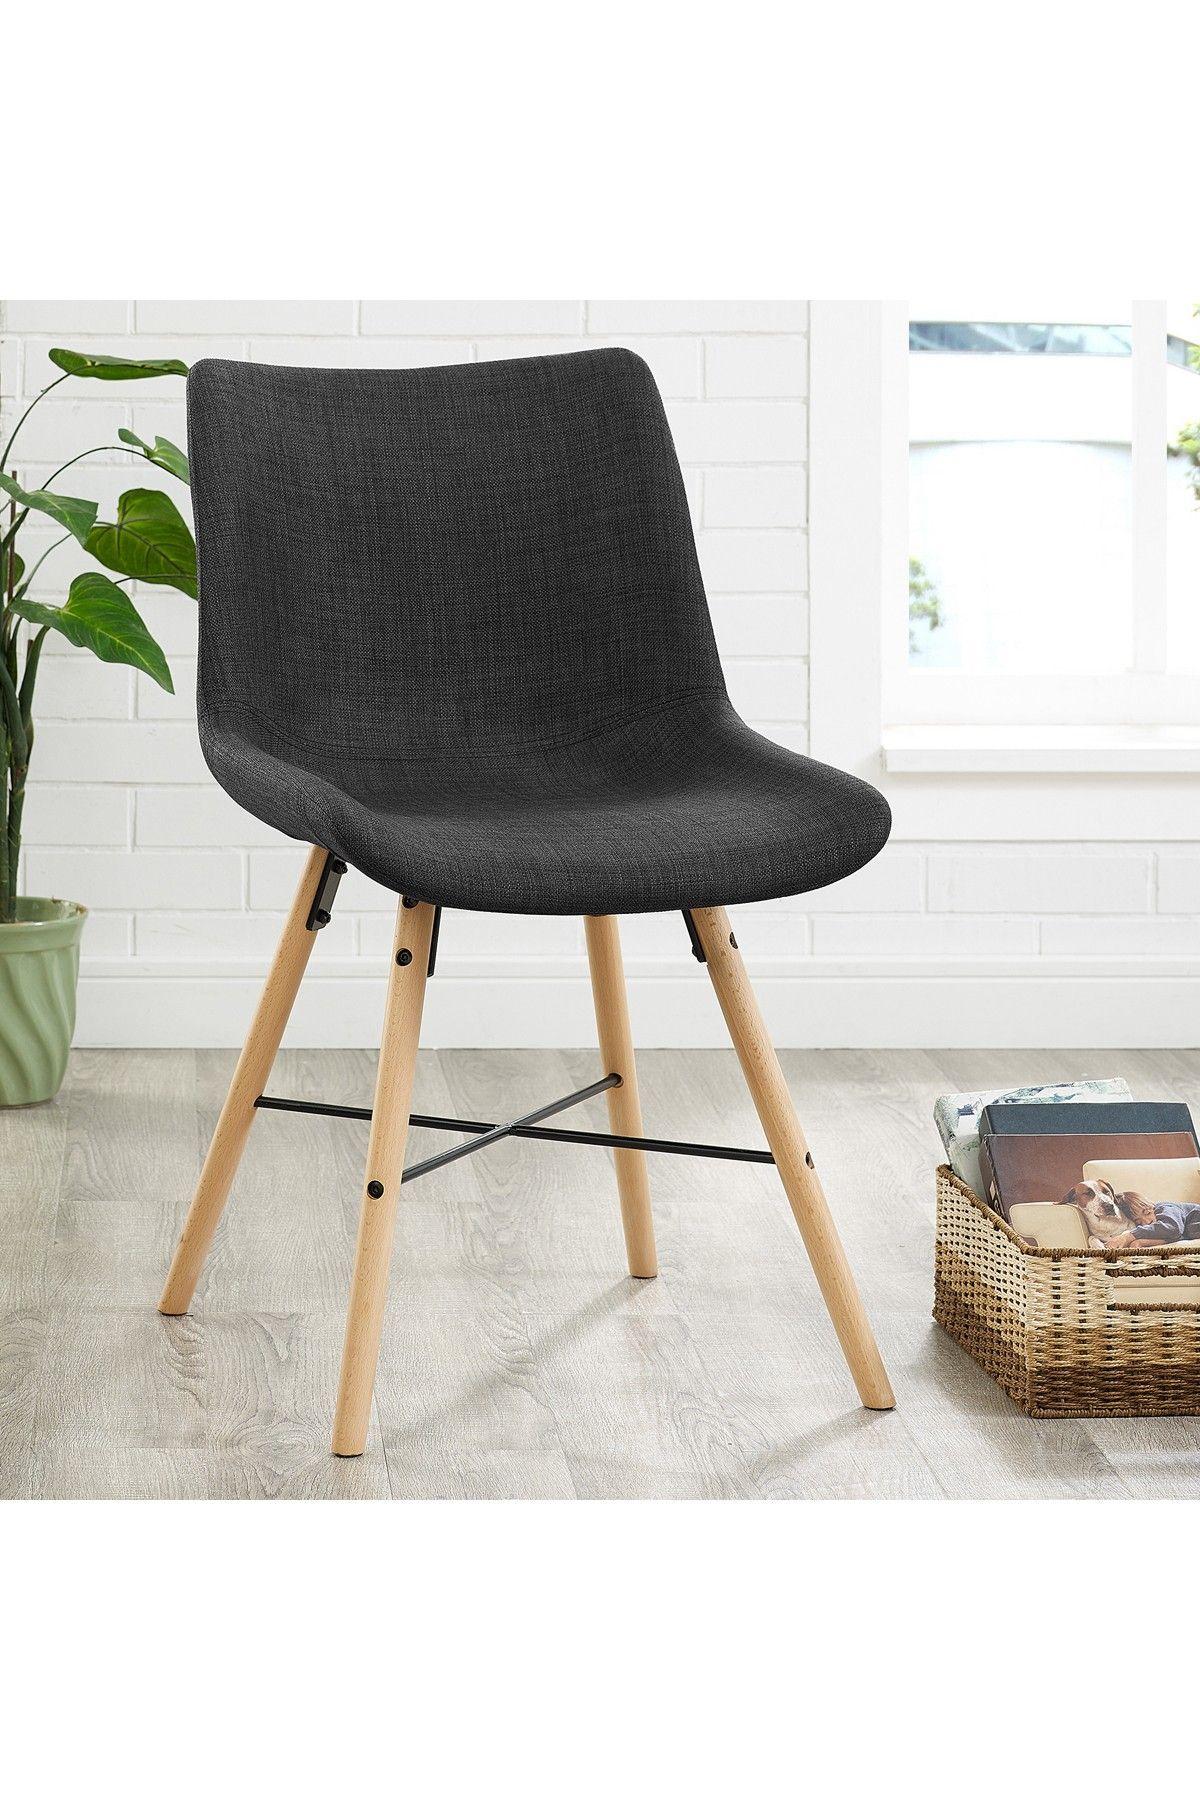 Walker Edison Furniture pany Upholstered Linen Charcoal Side